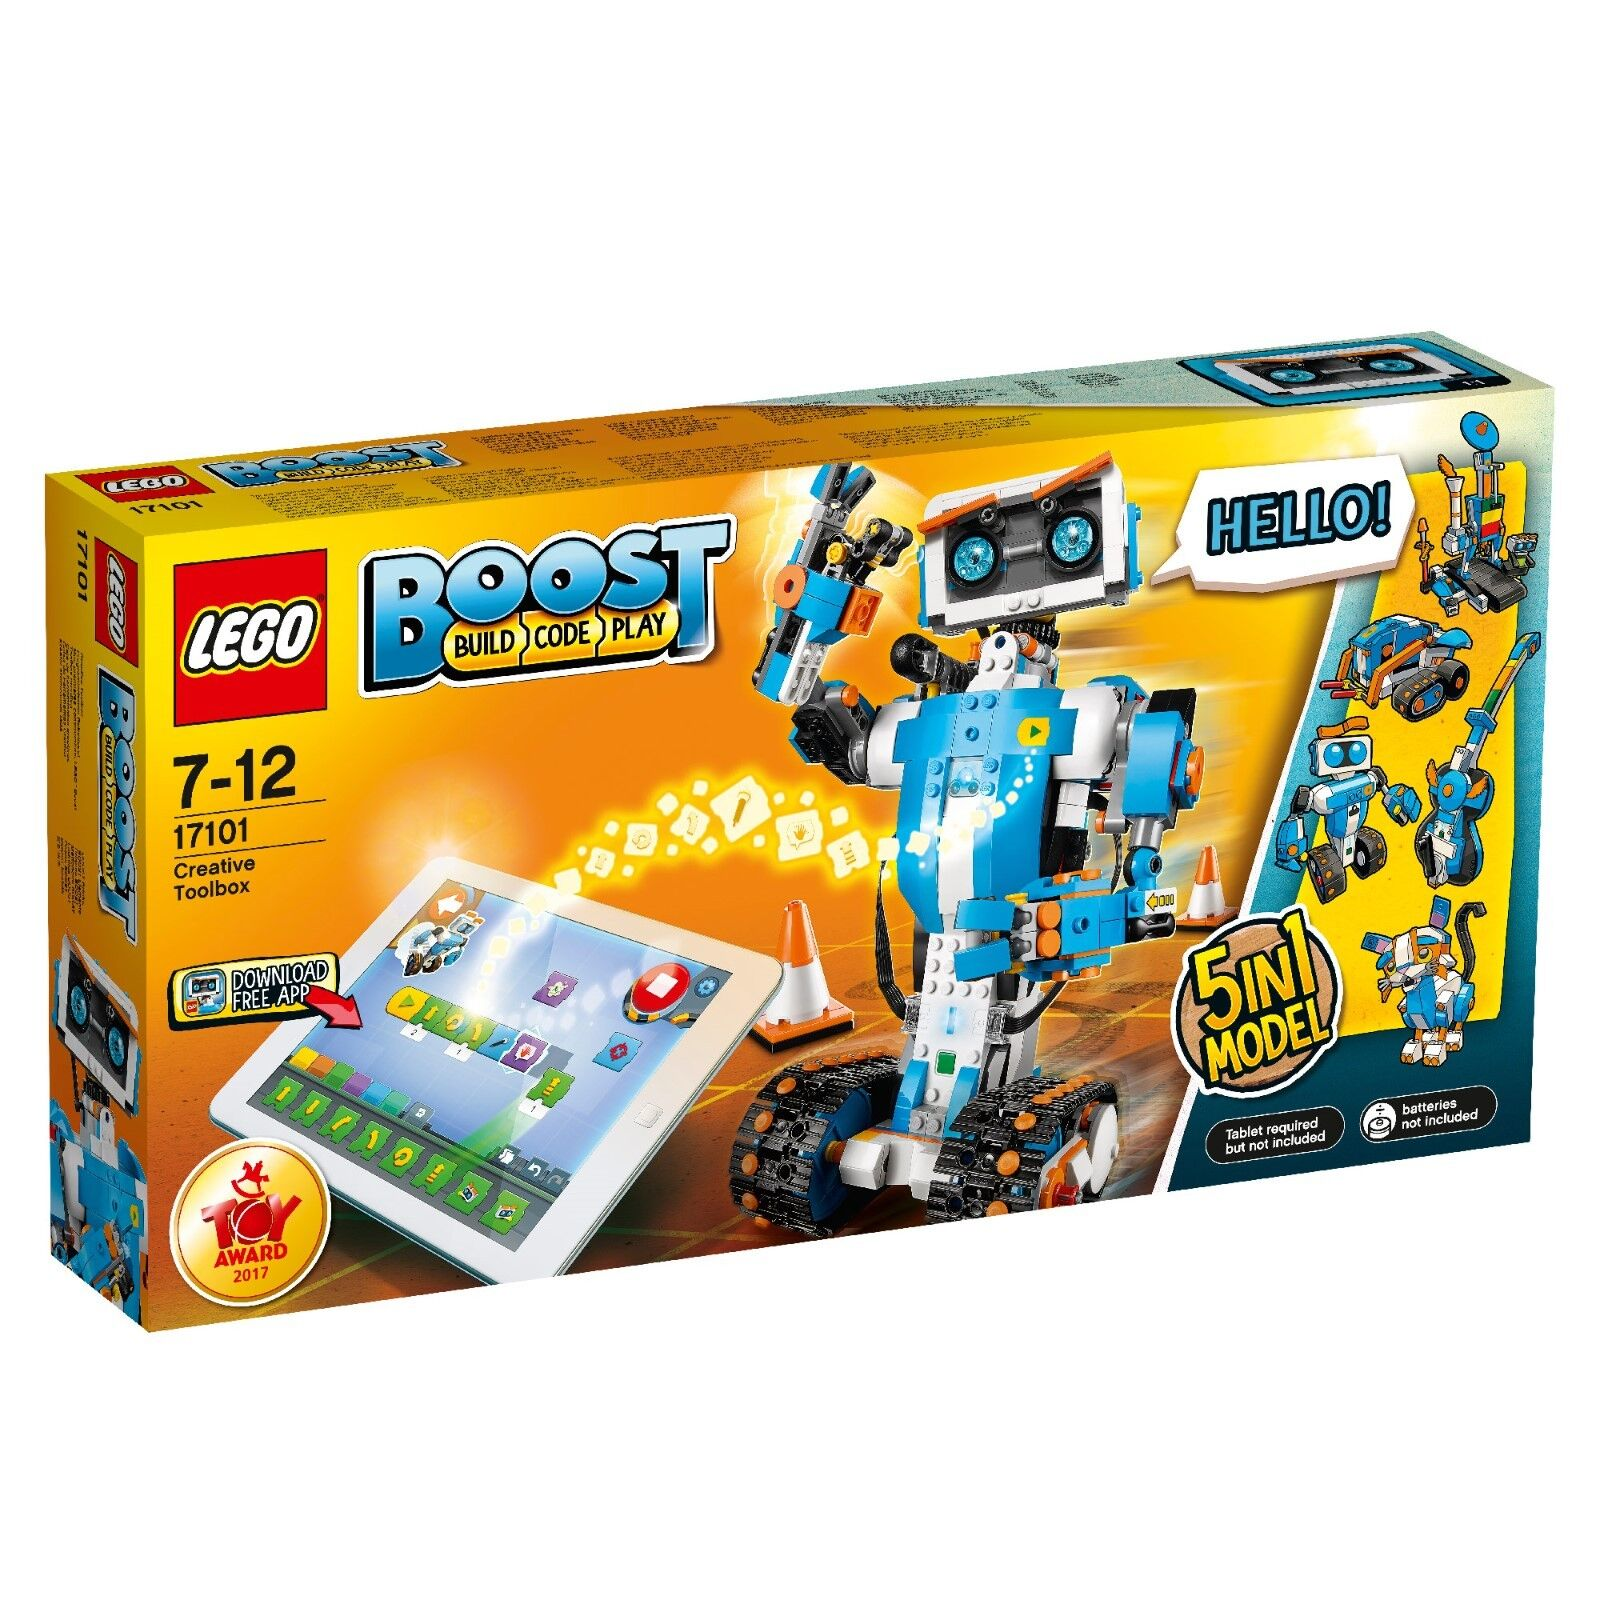 LEGO 17101 creativa wergzeugkasten elementi costitutivi,  Coloreeeato  vendite online